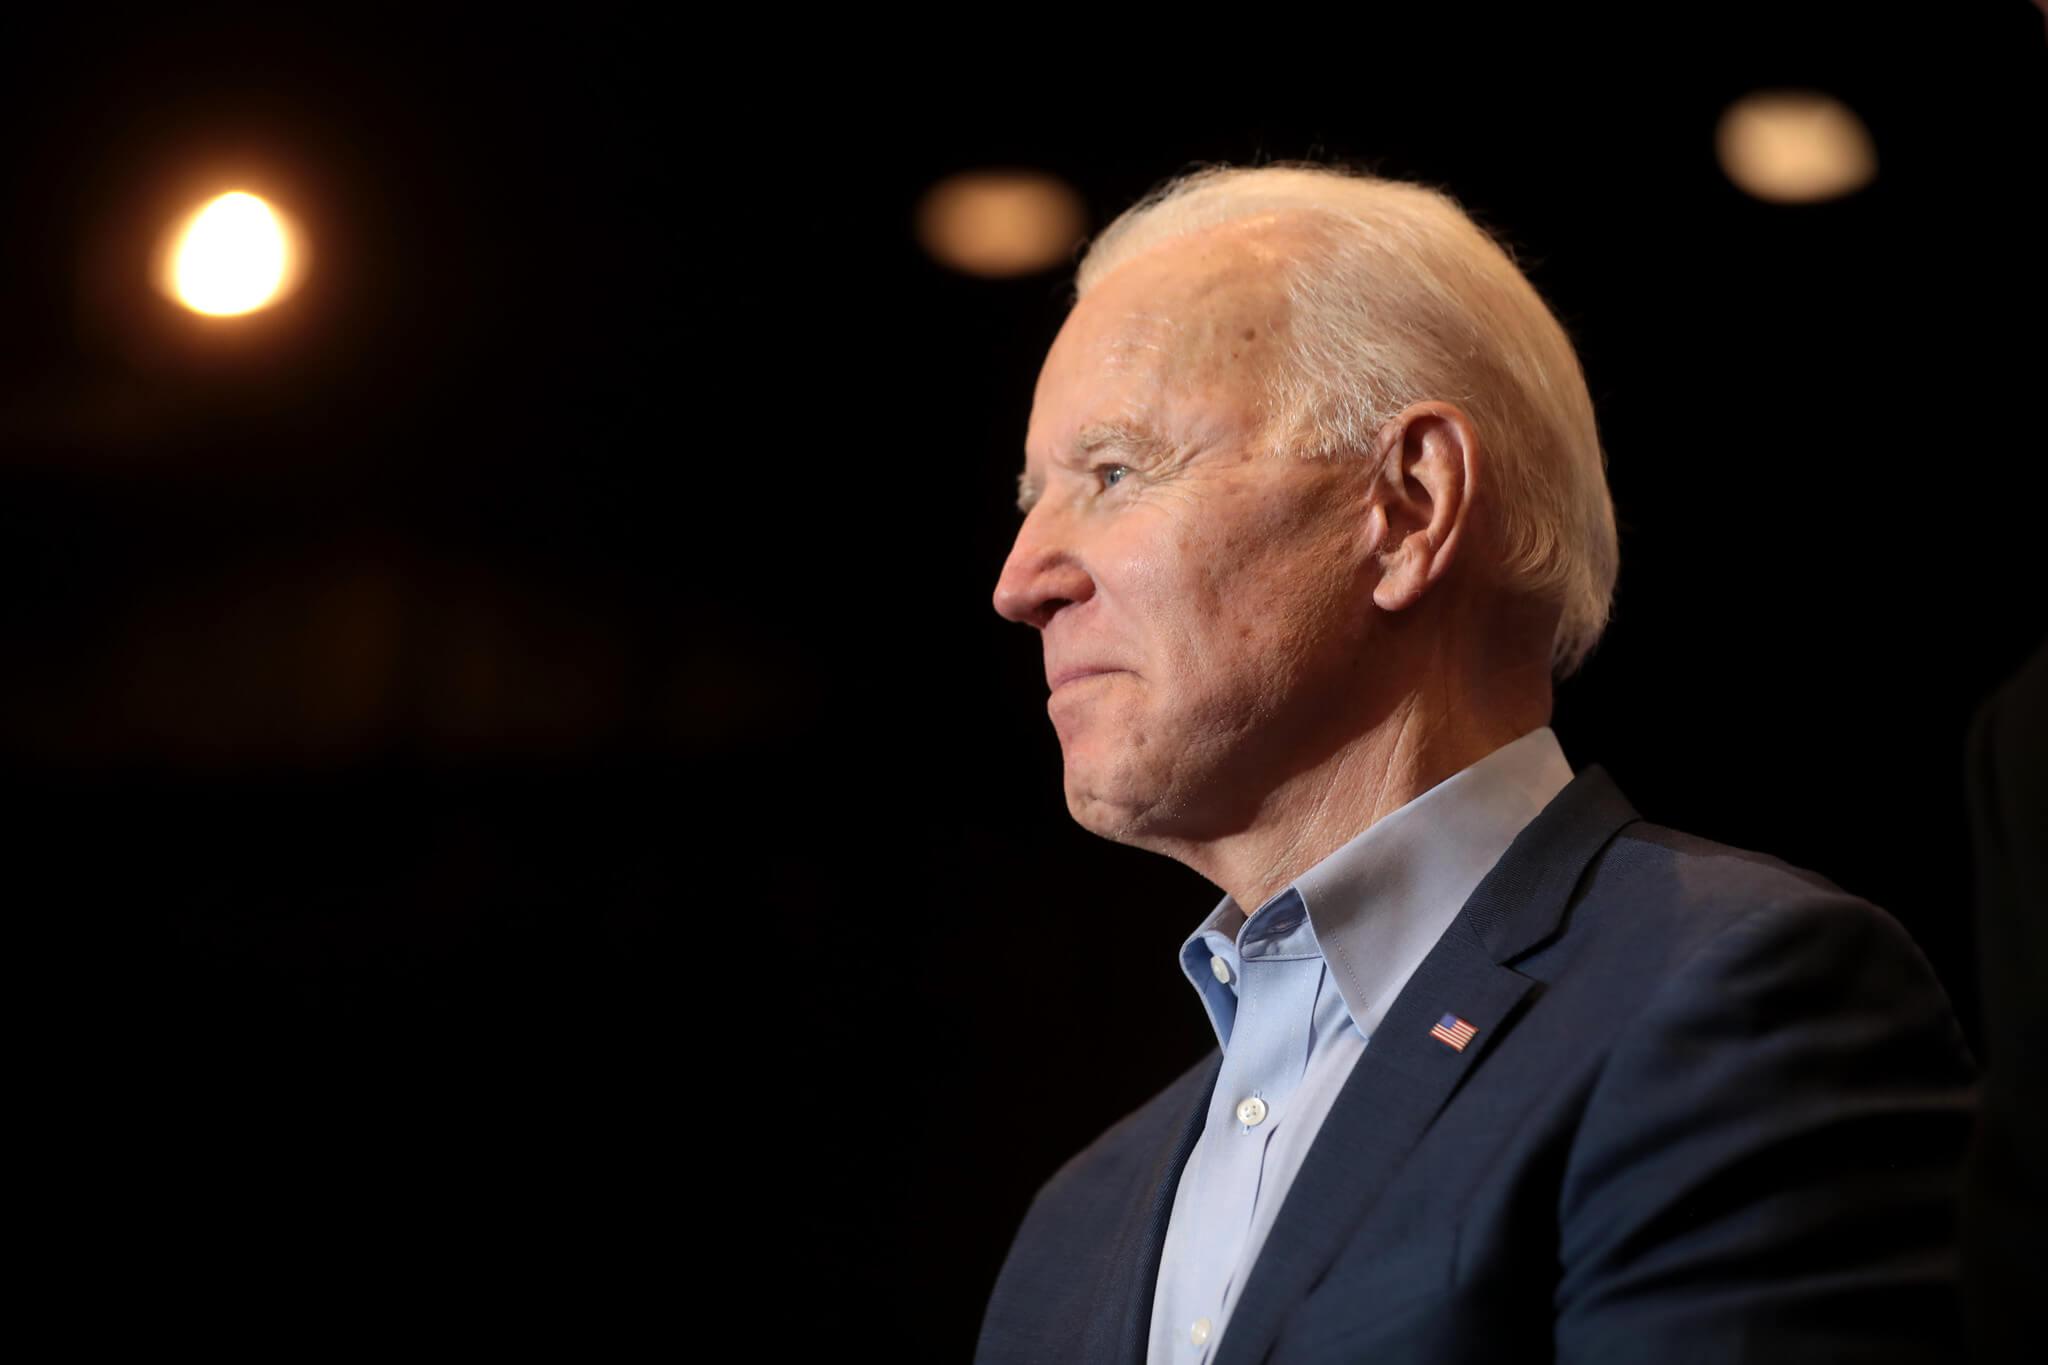 Photo of President Biden on the stage